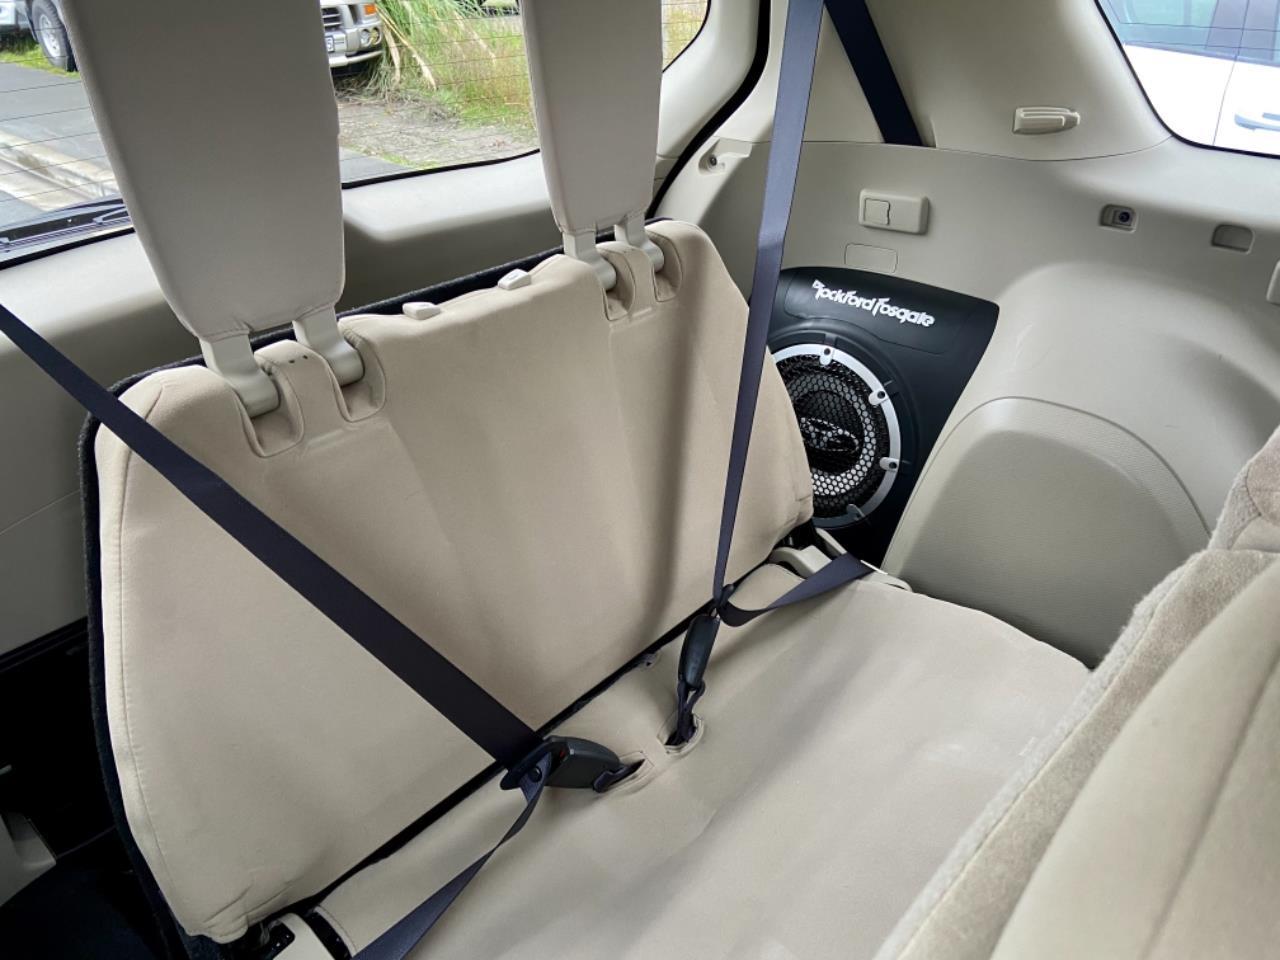 image-17, 2010 Mitsubishi Outlander 24G 4WD 7 Seater Facelif at Christchurch